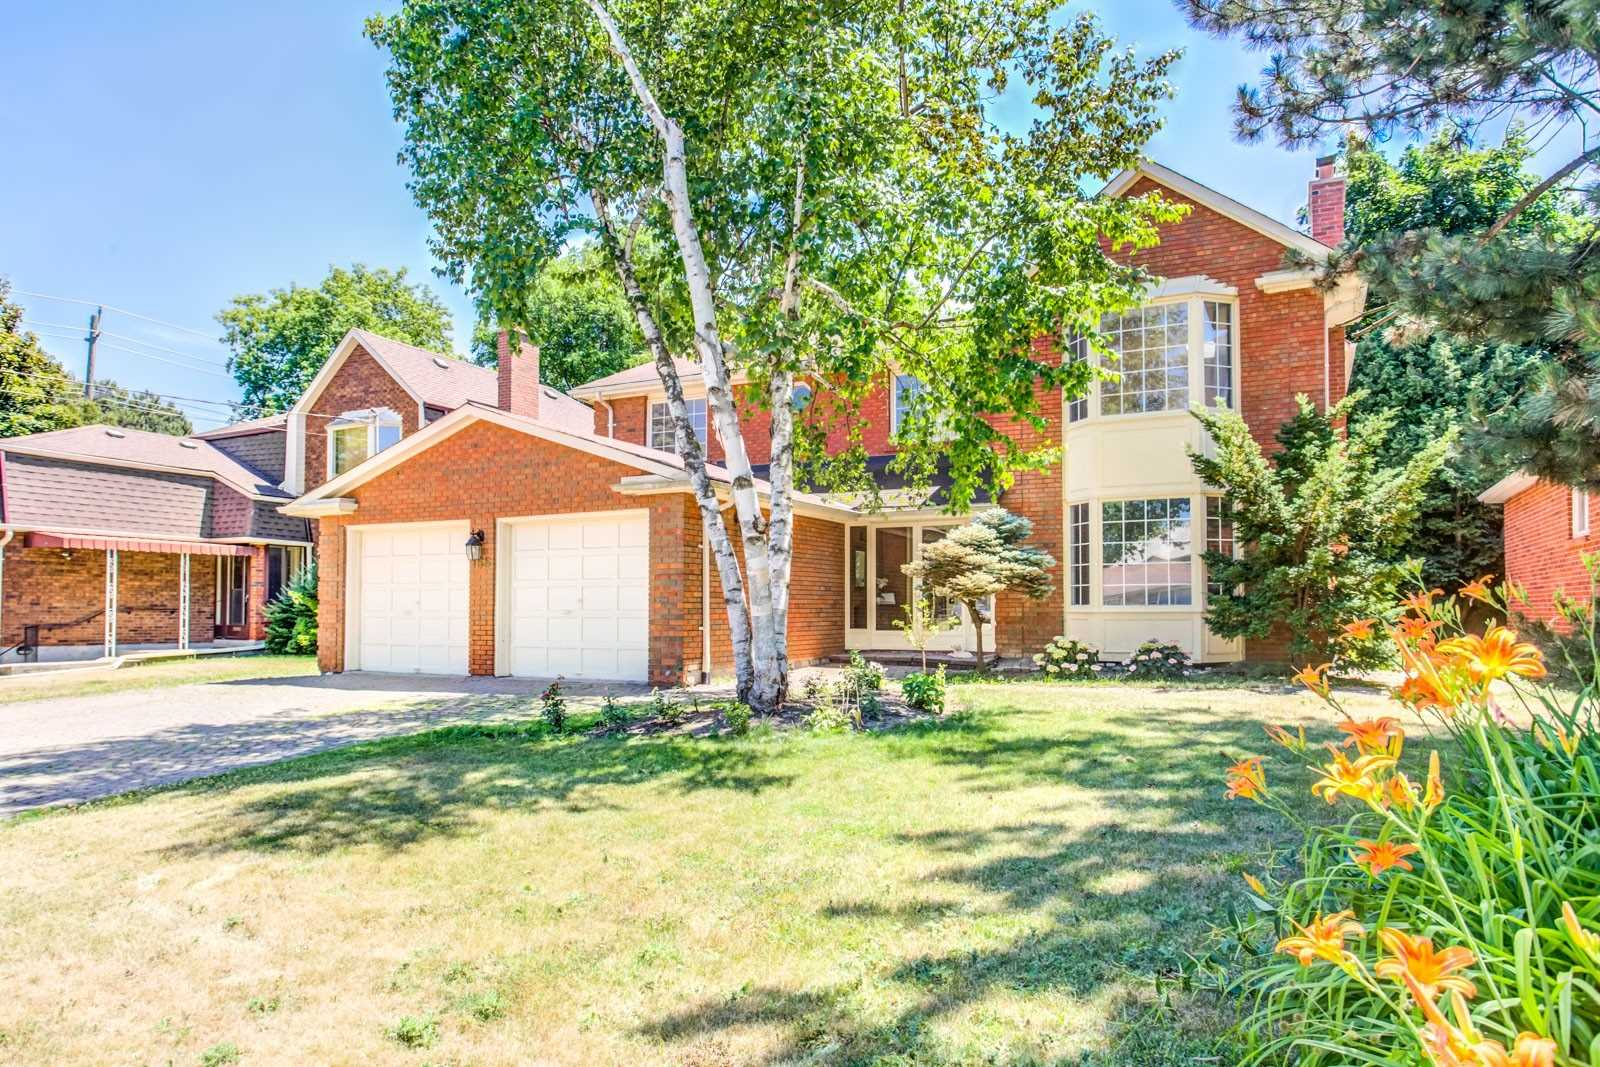 155 Highland Cres, Toronto, Ontario M2L1H2, 4 Bedrooms Bedrooms, 8 Rooms Rooms,4 BathroomsBathrooms,Detached,For Sale,Highland,C4846127